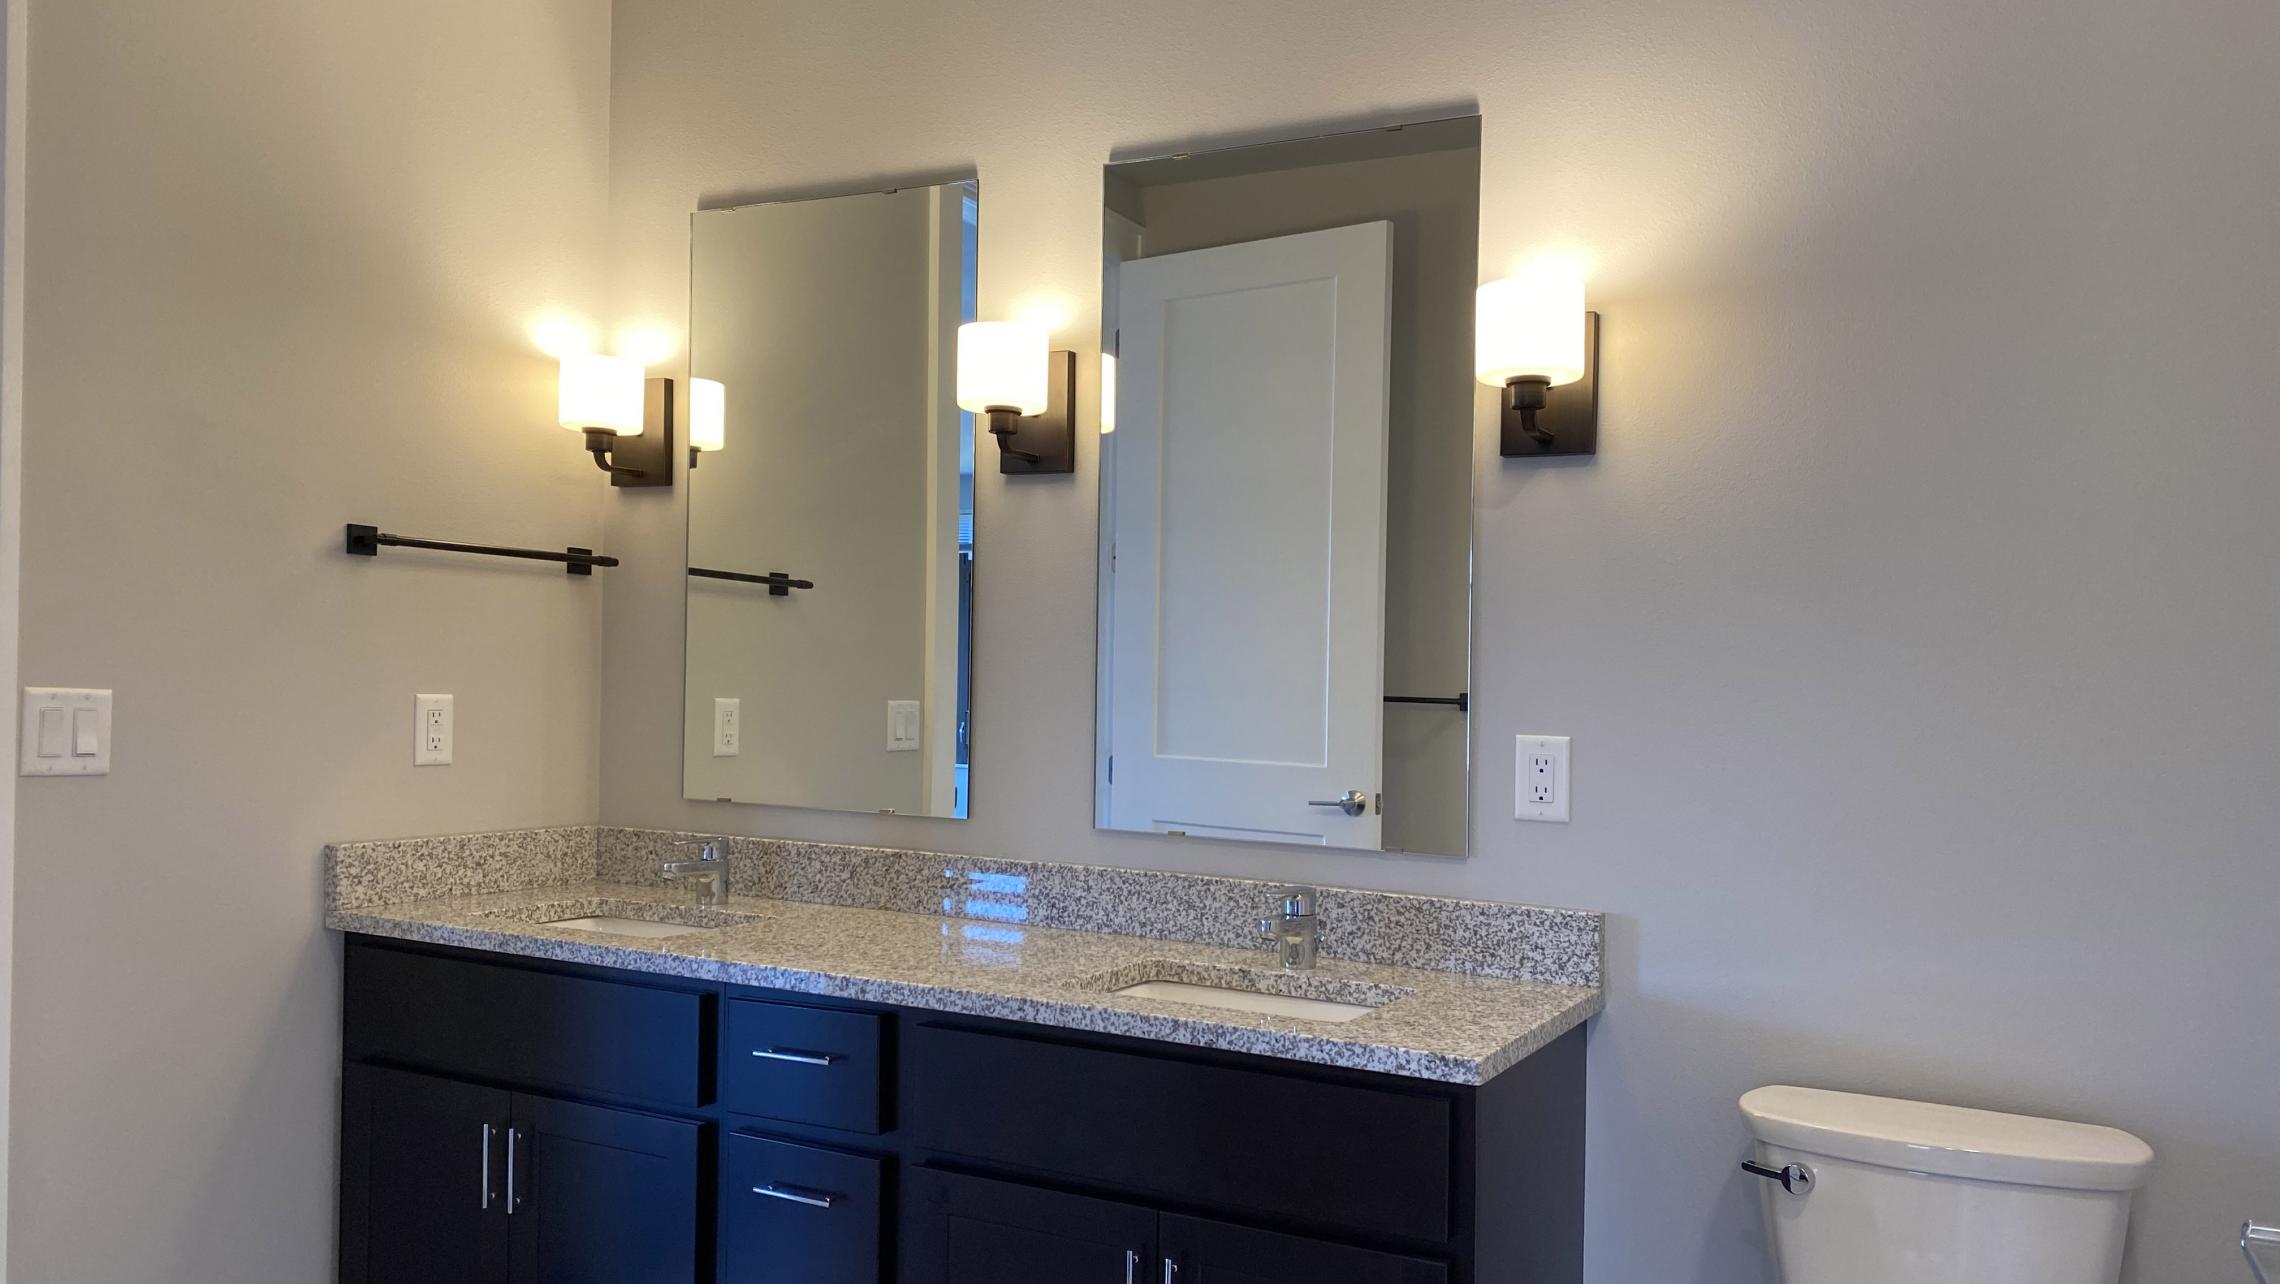 1722-Monroe-Apartments-320-Three-Bedroom-Modern-Upscale-Design-Windows-Natural-Light-Balcony-Gym-Terrace-Living-Luxury-Lounge-Madison-Views-Bathroom-Soaking-Tub-Vanity